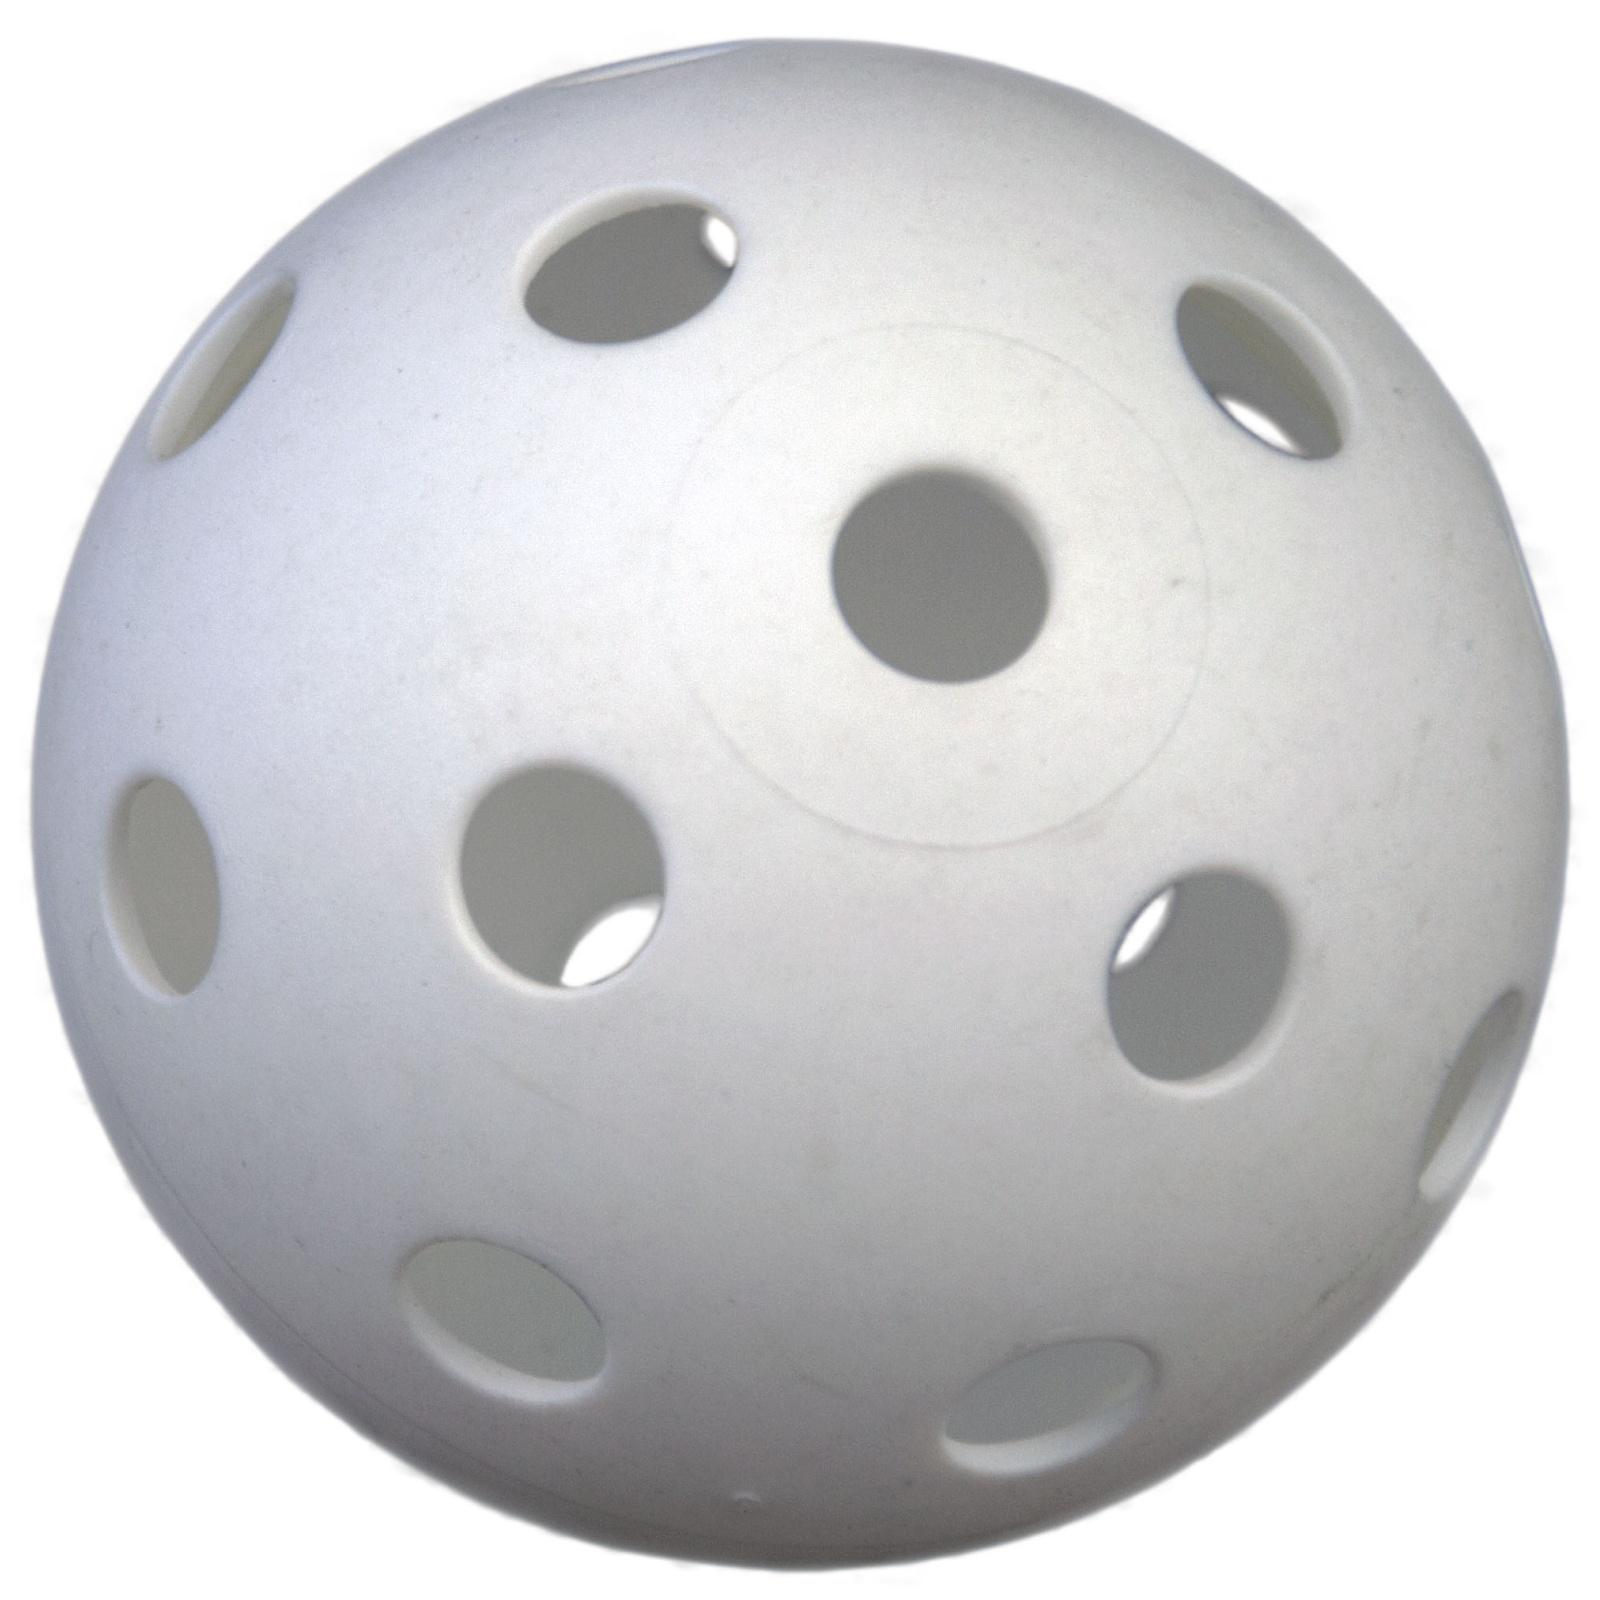 Florbalové míčky SPOKEY Sprint - 6ks, bílé